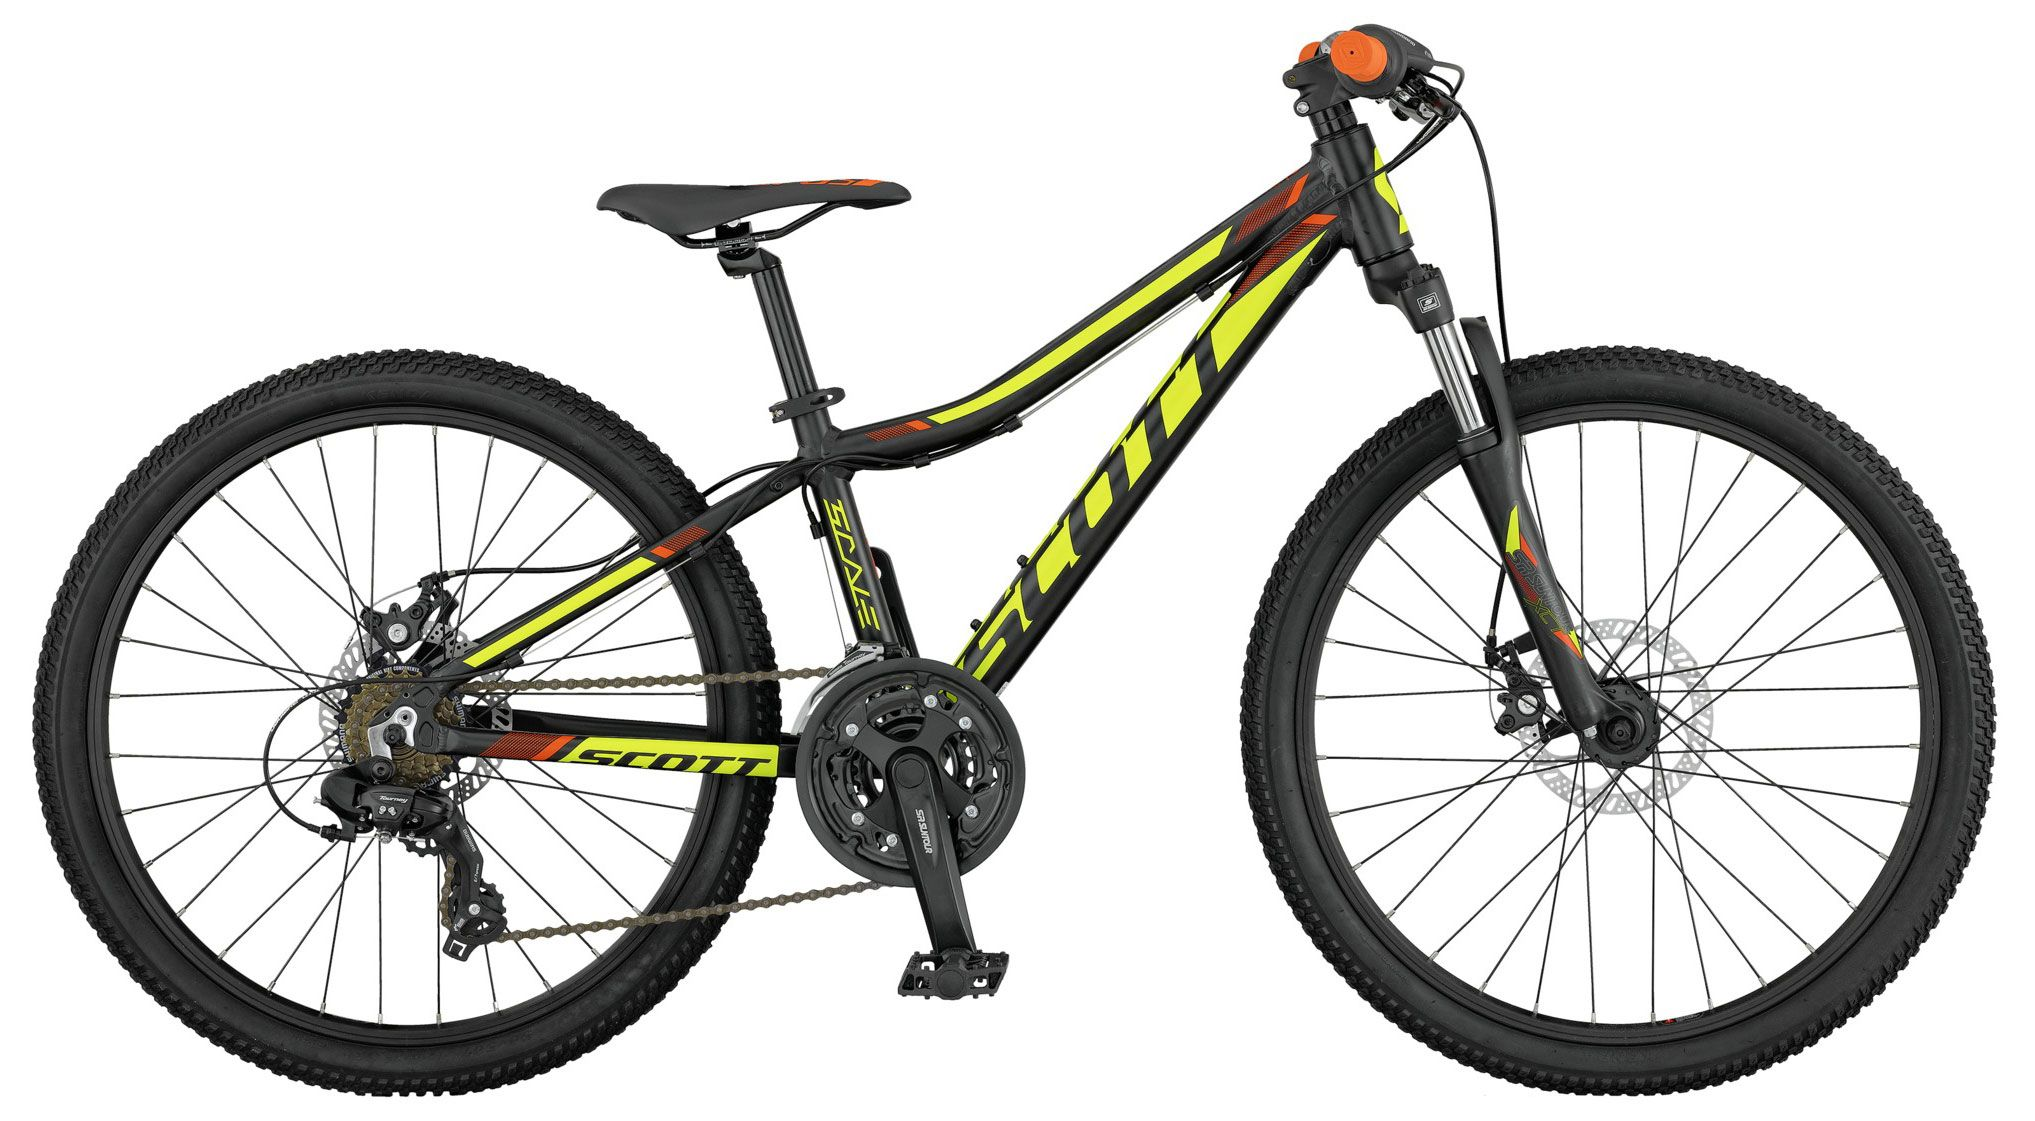 Велосипед Scott Scale JR 24 disc 2017 велосипед scott scale jr 24 rigid fork 2017